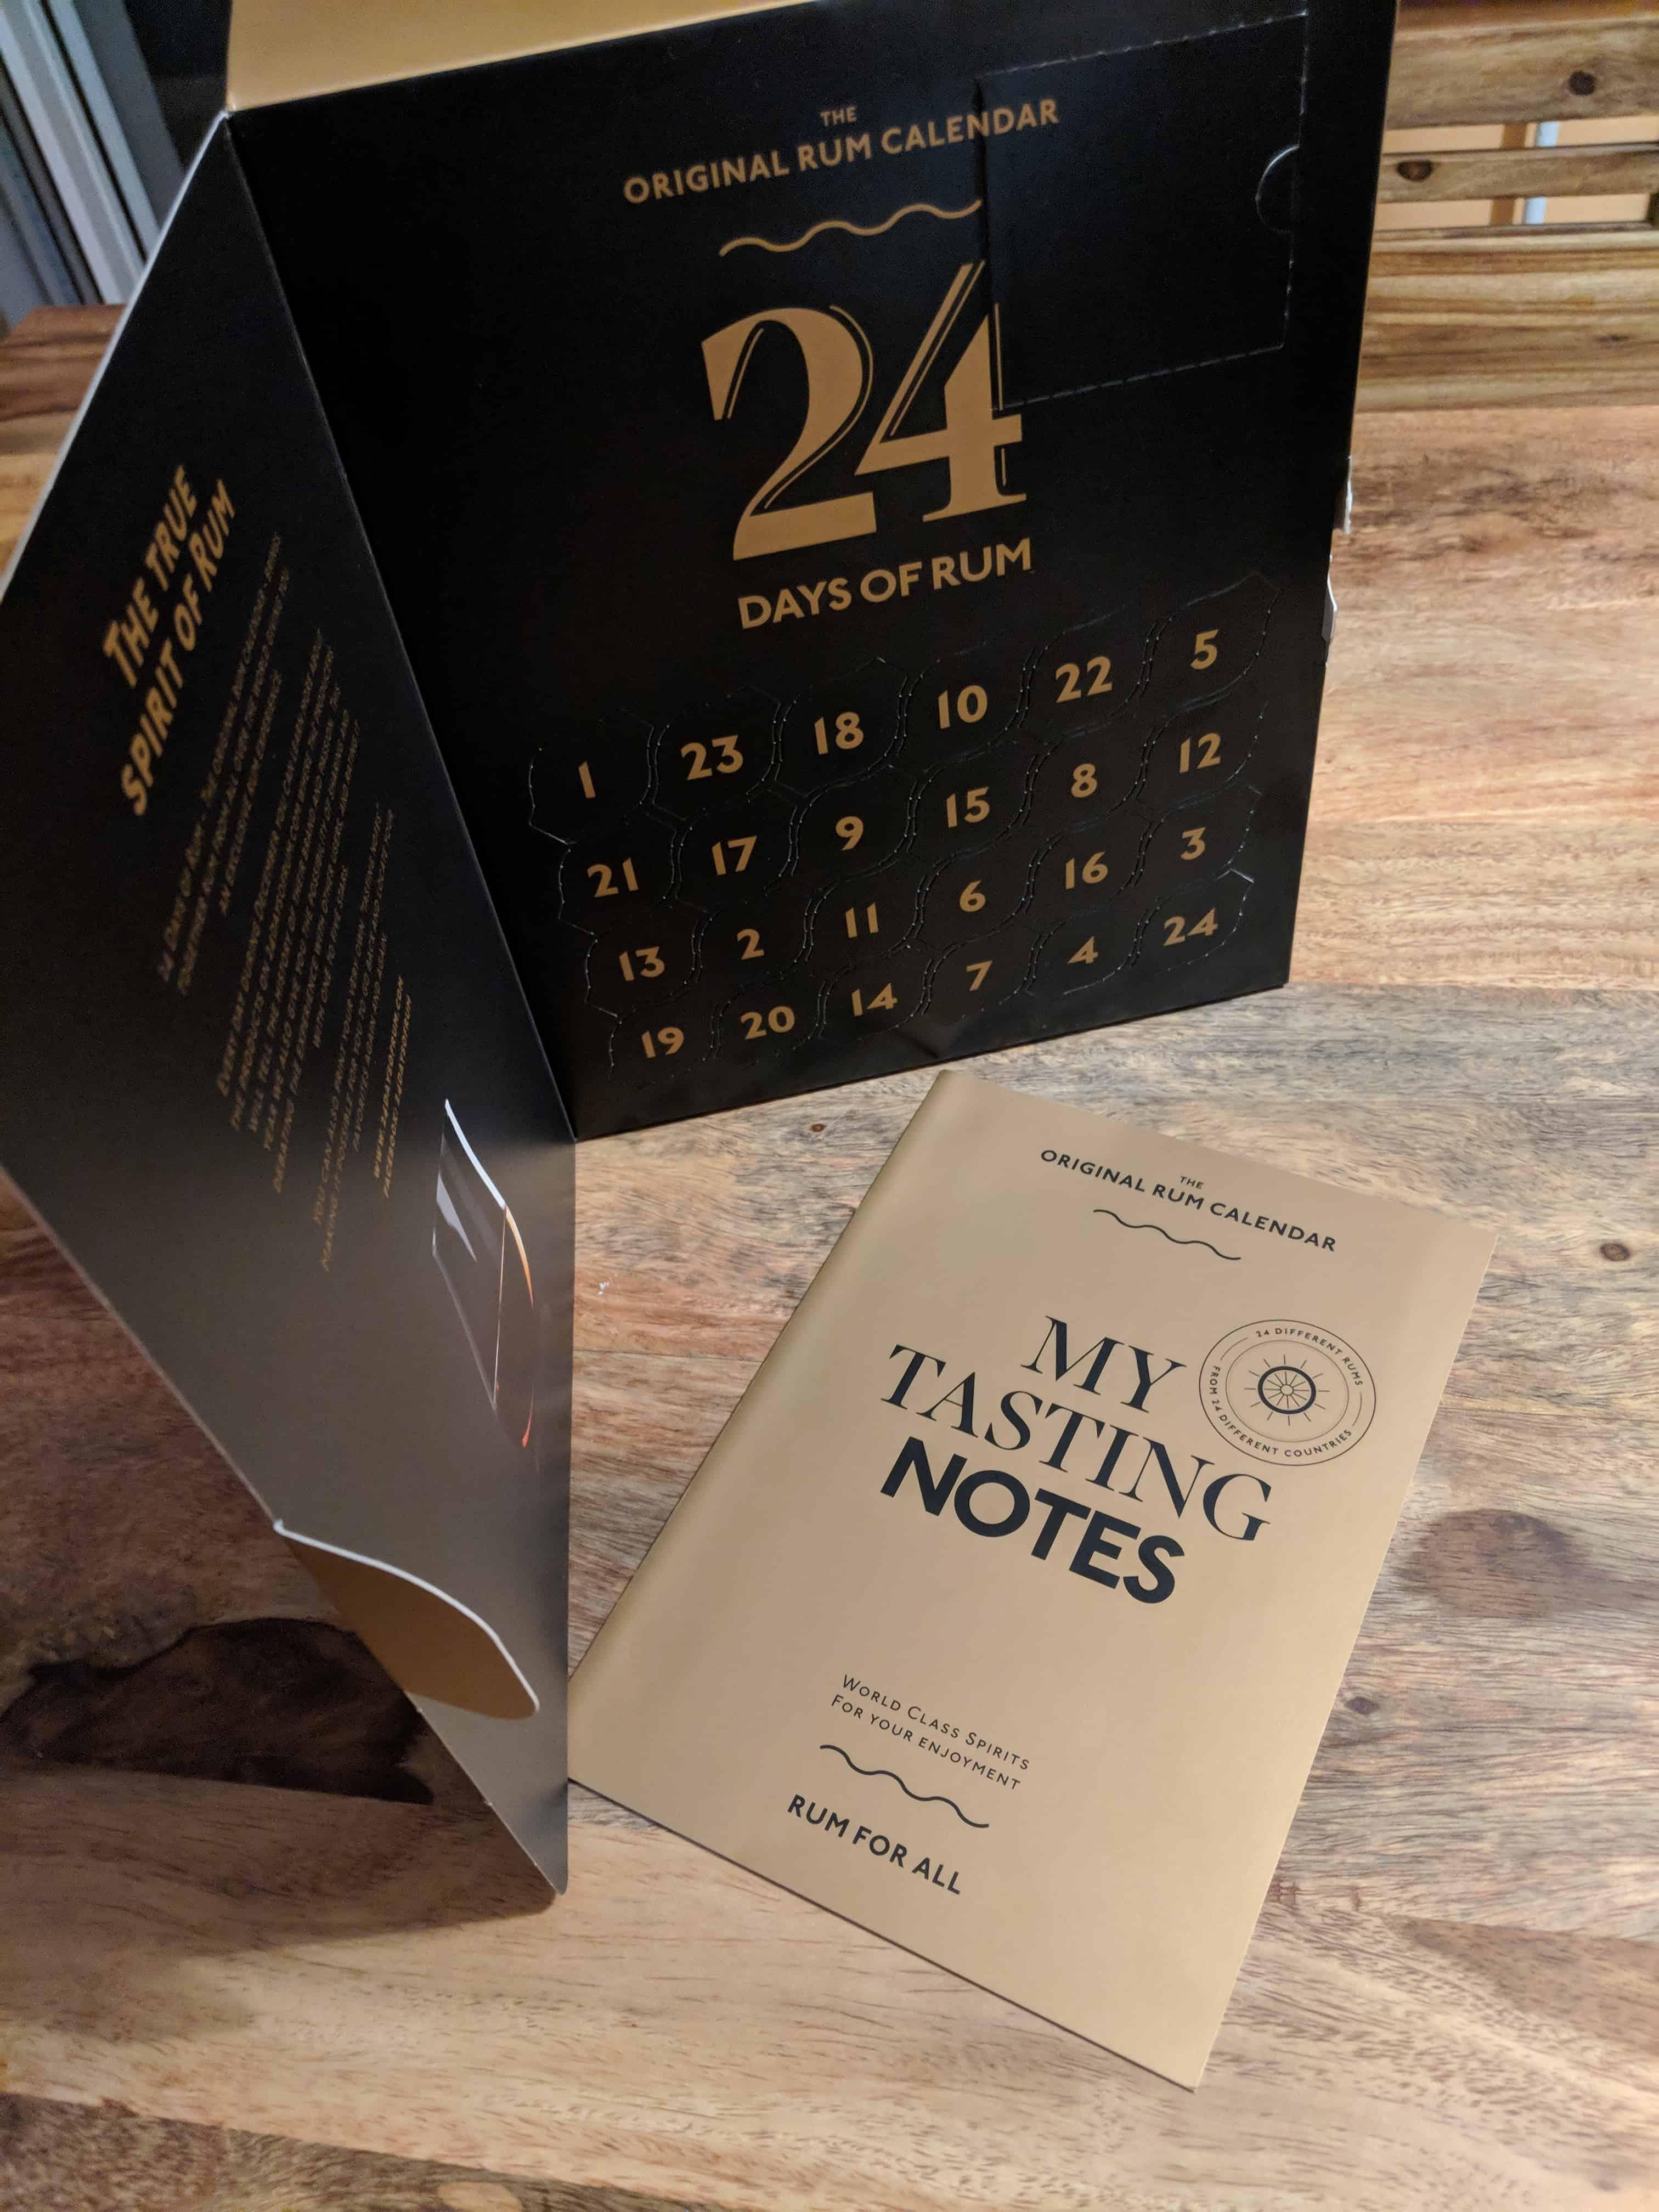 Rumový kalendář 2018 a tasting notes